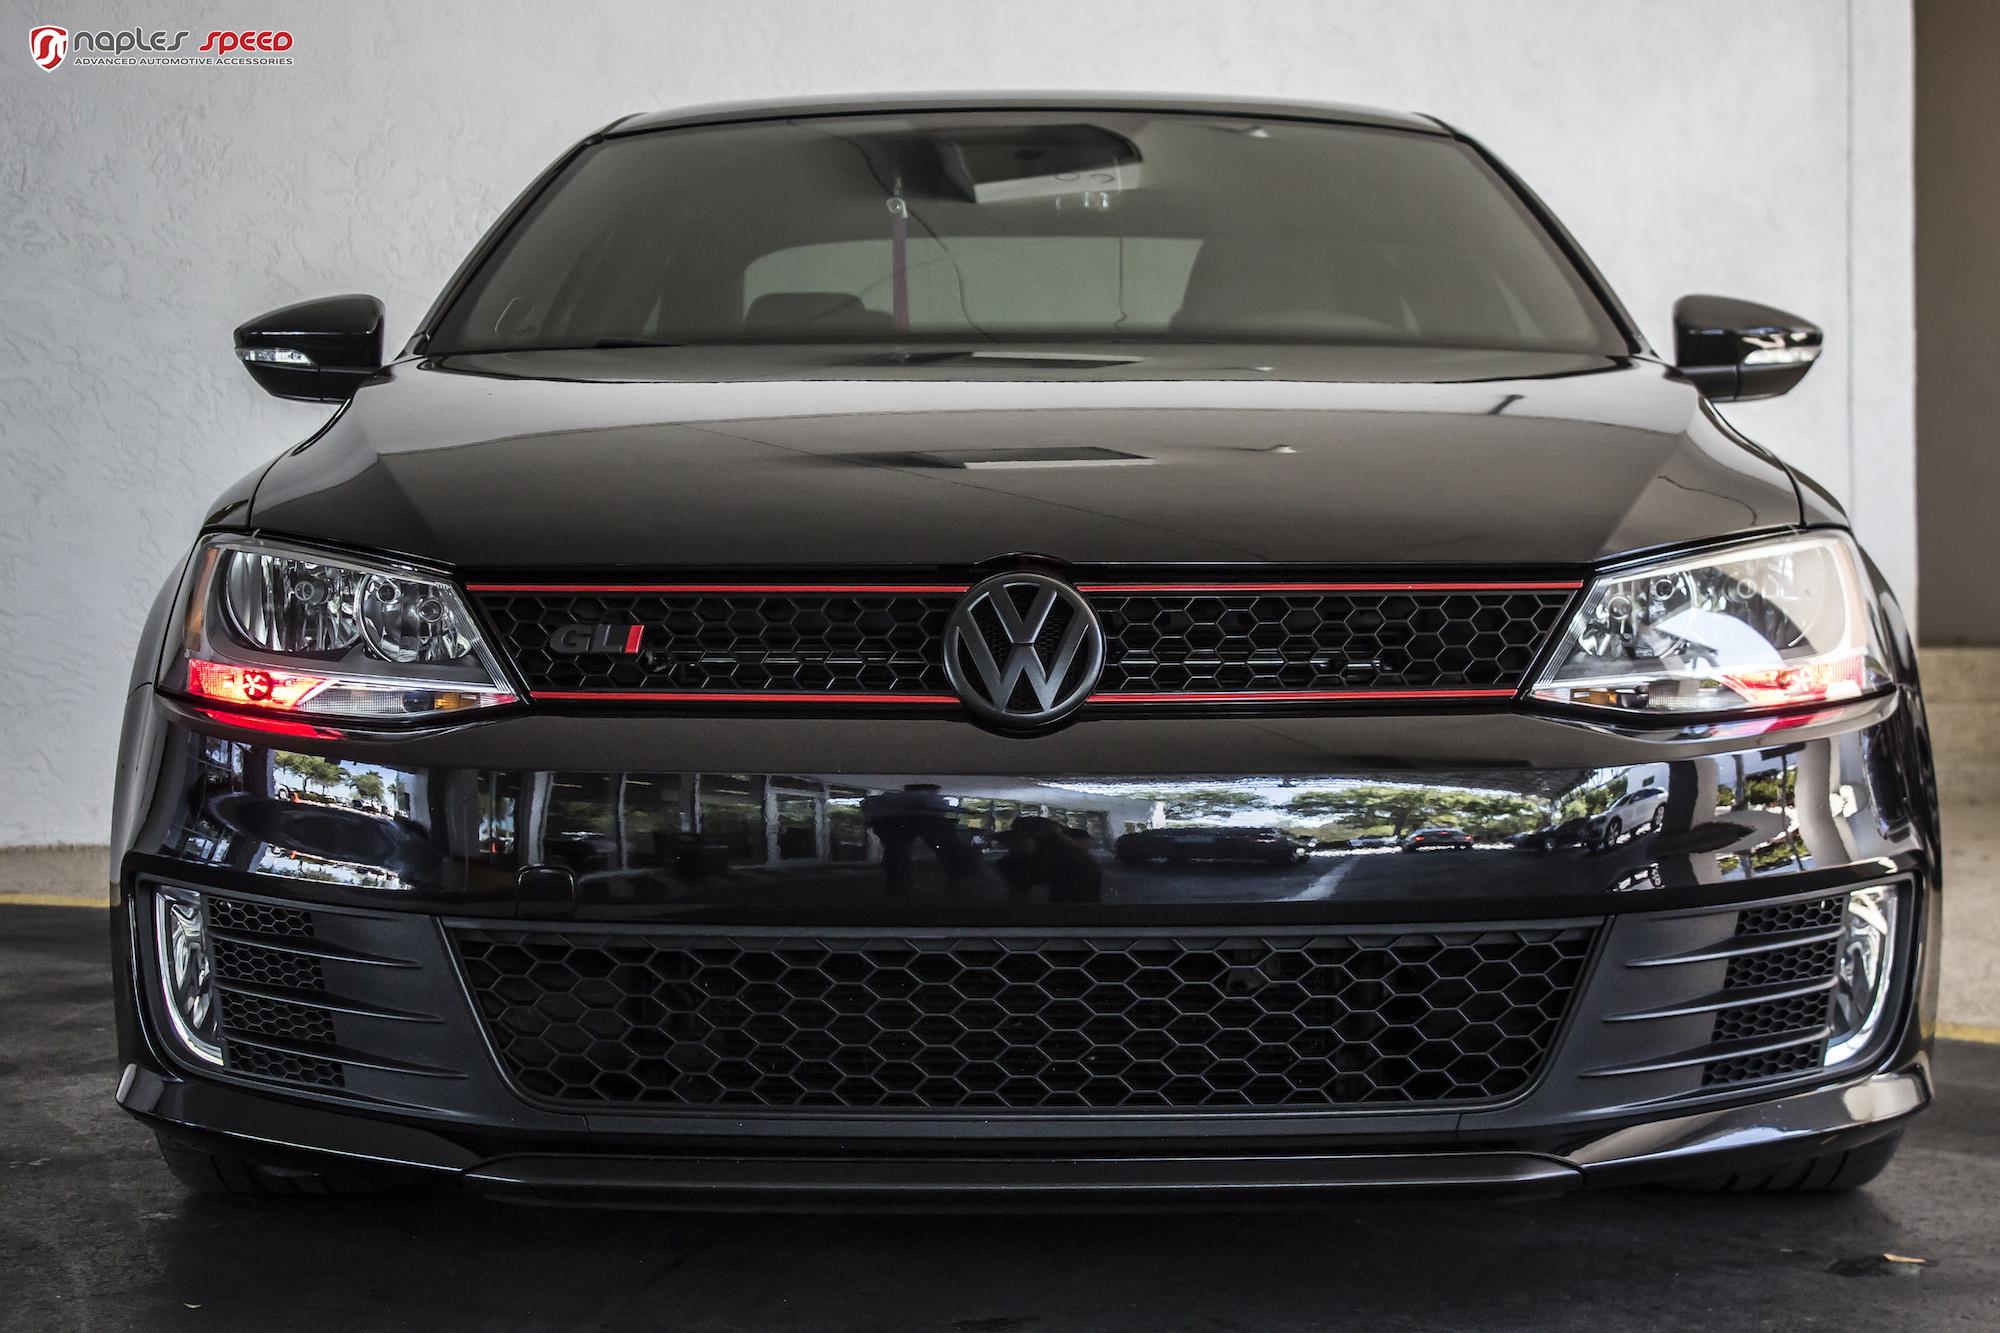 2014 Volkswagen GLI on VMR 710 wheels – Advanced ...